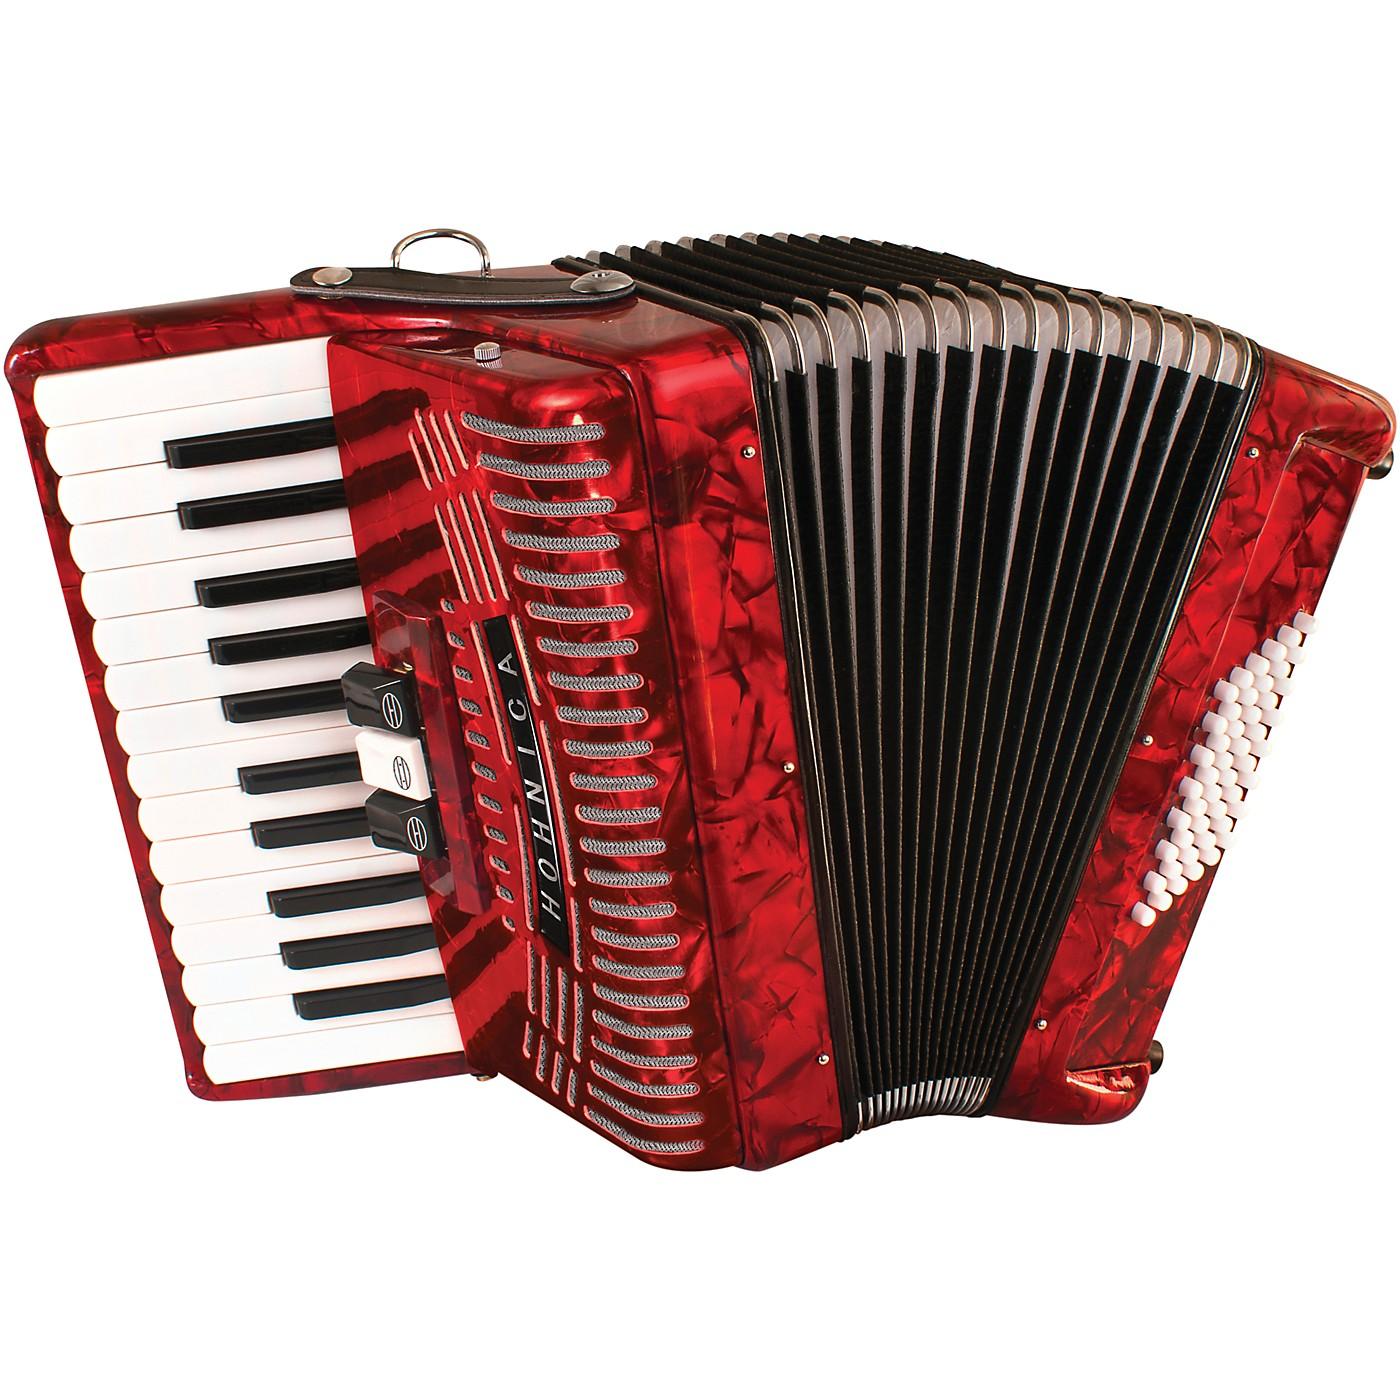 Hohner 48 Bass Entry Level Piano Accordion thumbnail